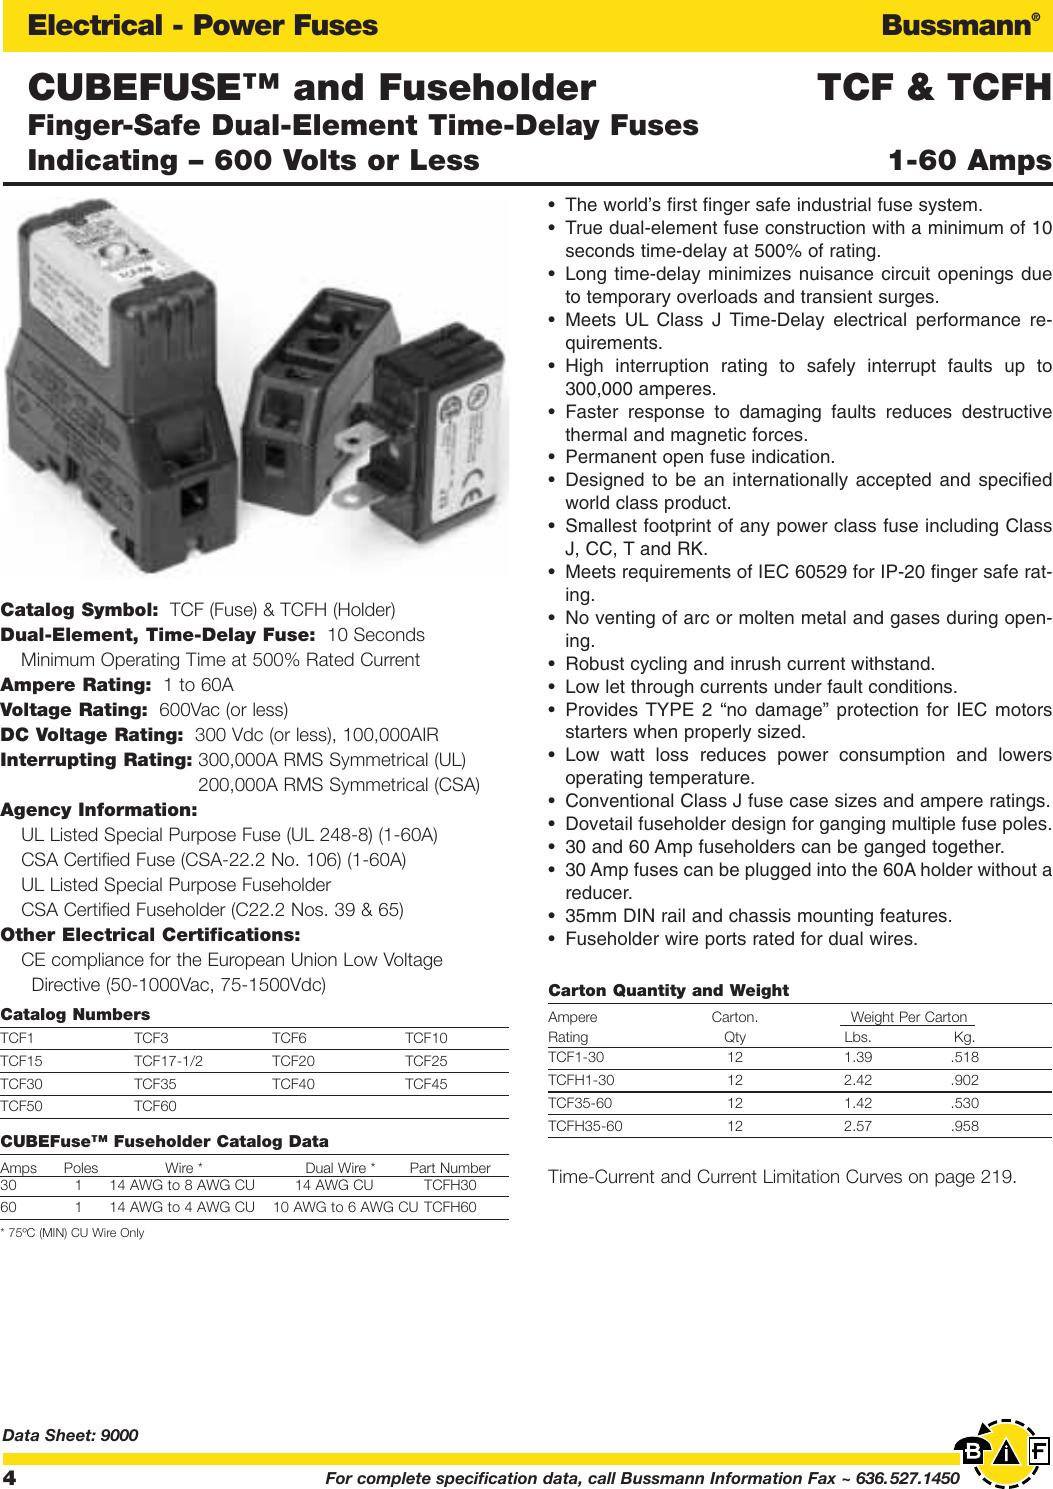 EACH nnb BUSSMAN FUSE  SC-5 600V 5A INDUSTRIAL POWER FUSE   ..